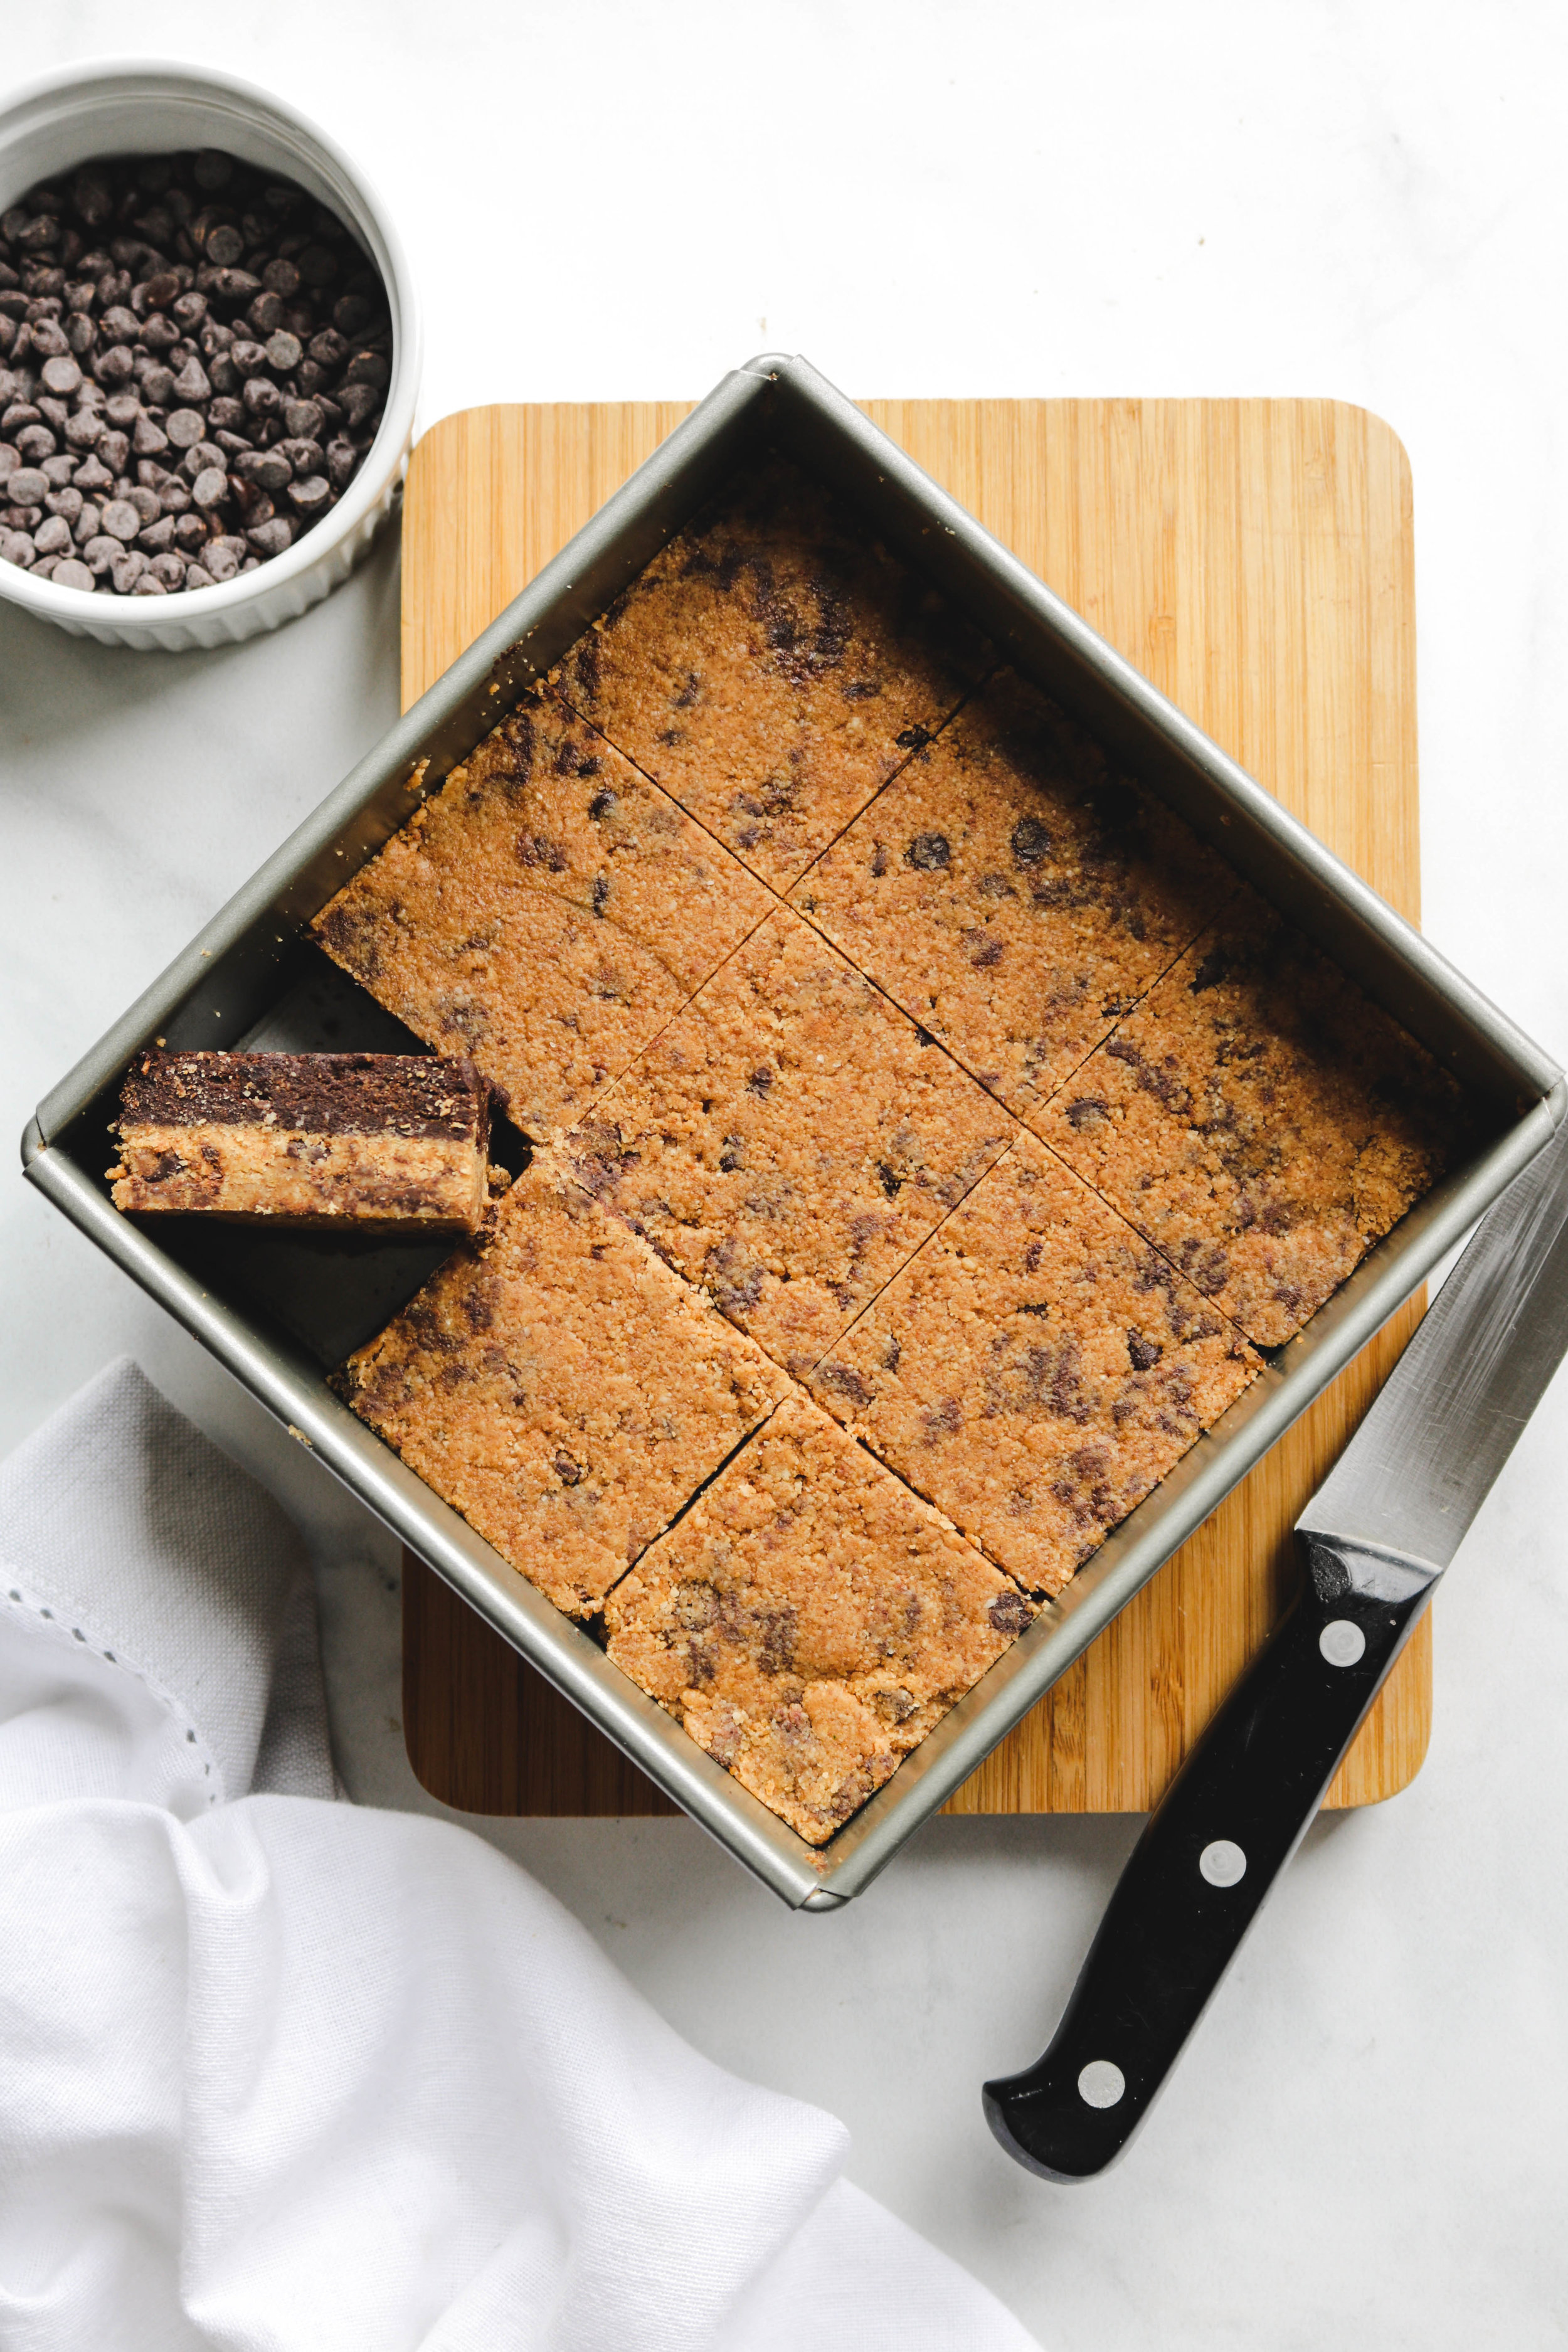 No Bake Cookie Dough Brownies in the pan